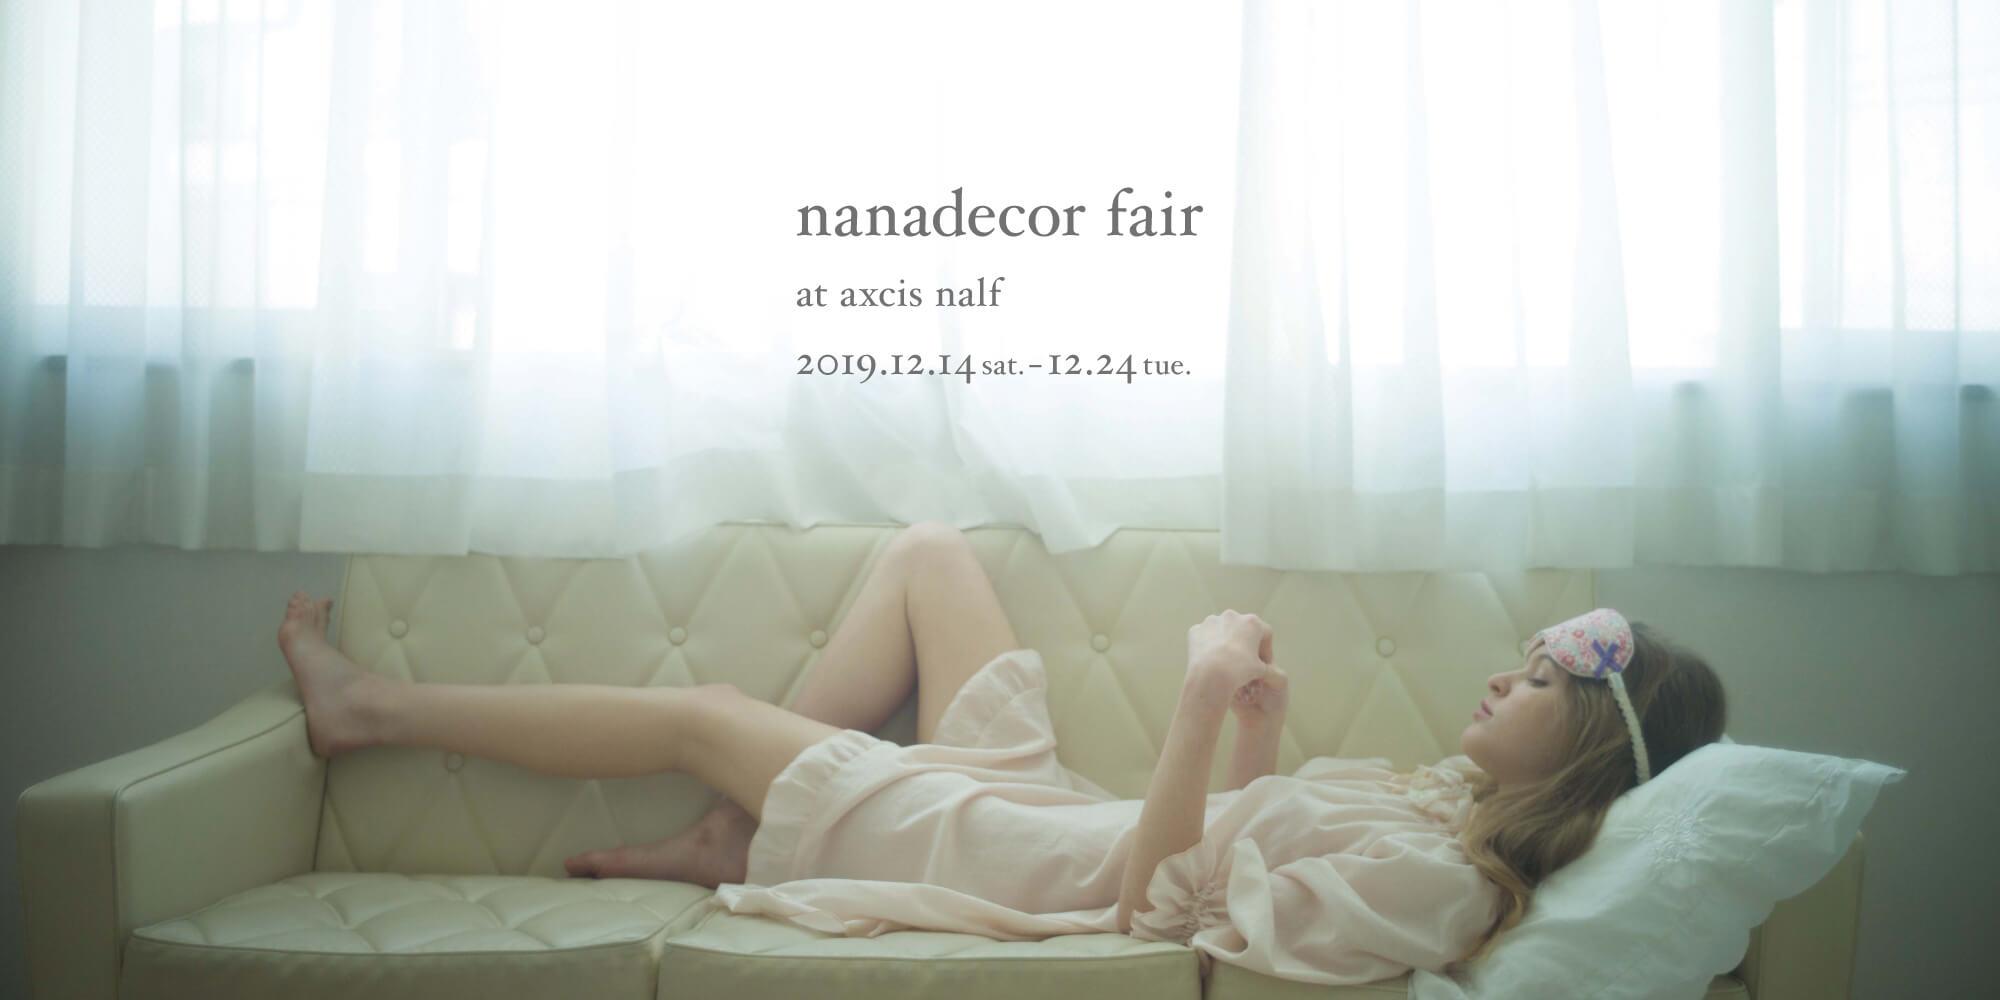 nanadecor fairのイベント情報を掲載しました。